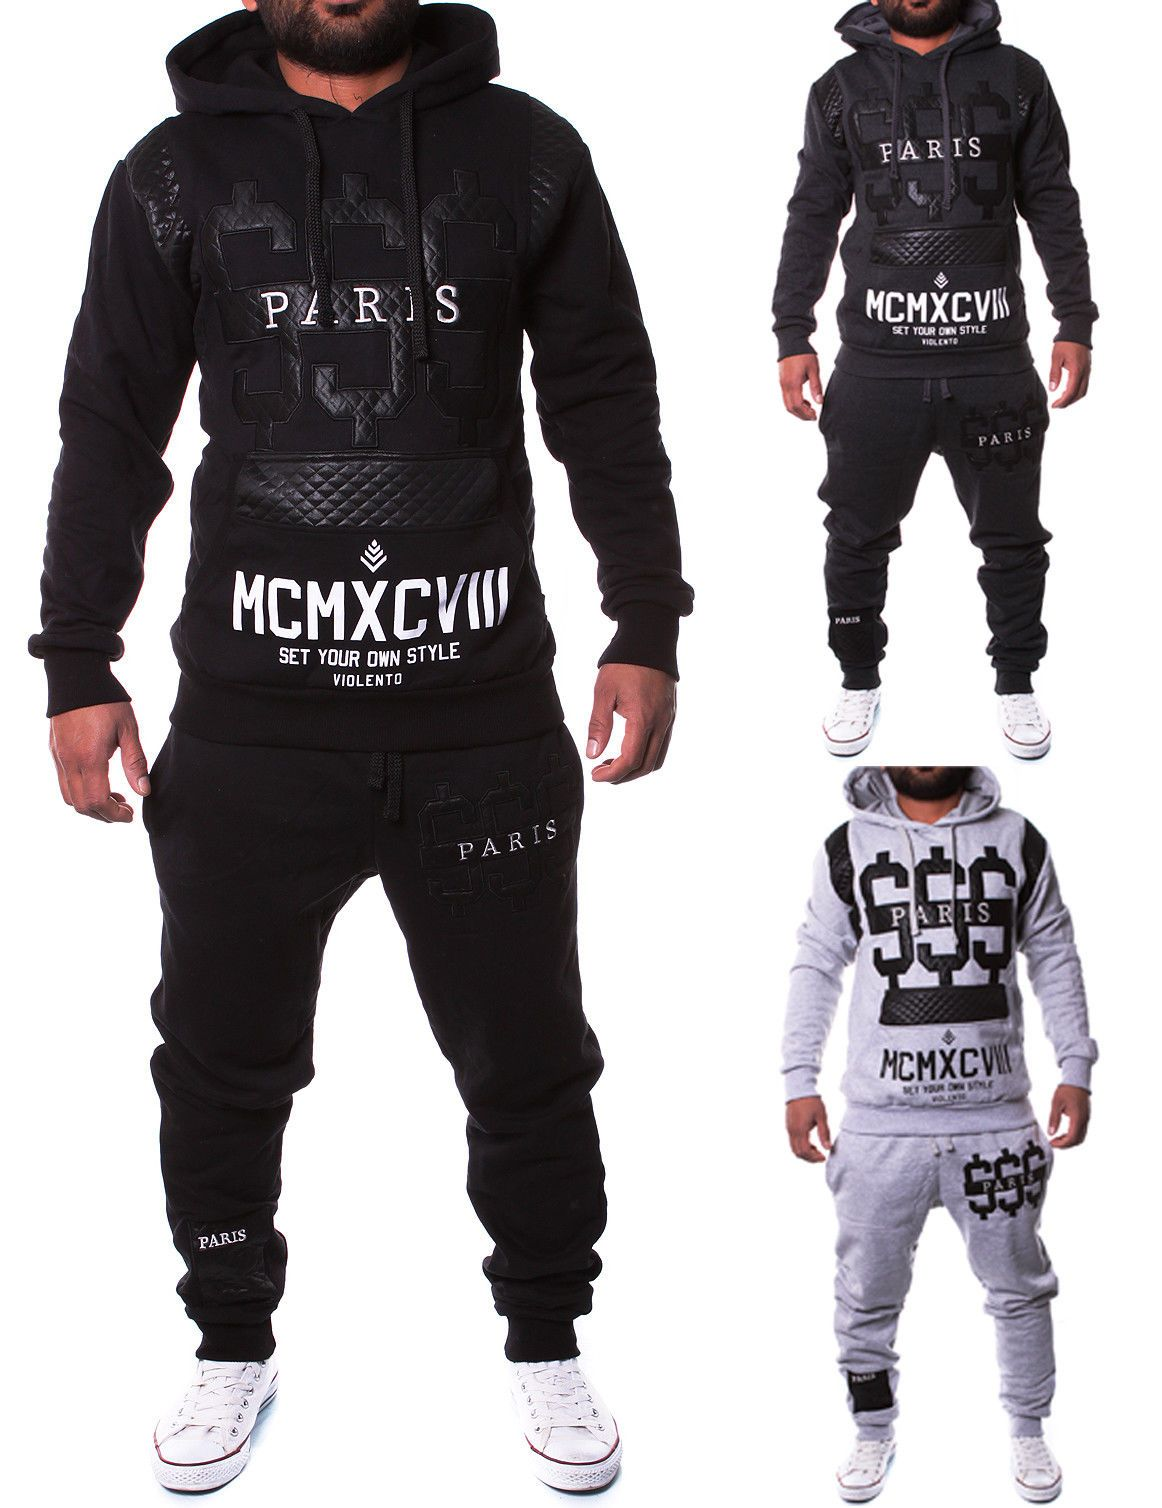 84fc77ffe1b6 Track Suits 59339  Leather Mens Jogging Suit Jacket Sports Pants Fitness  Hoodie Pants S16 S